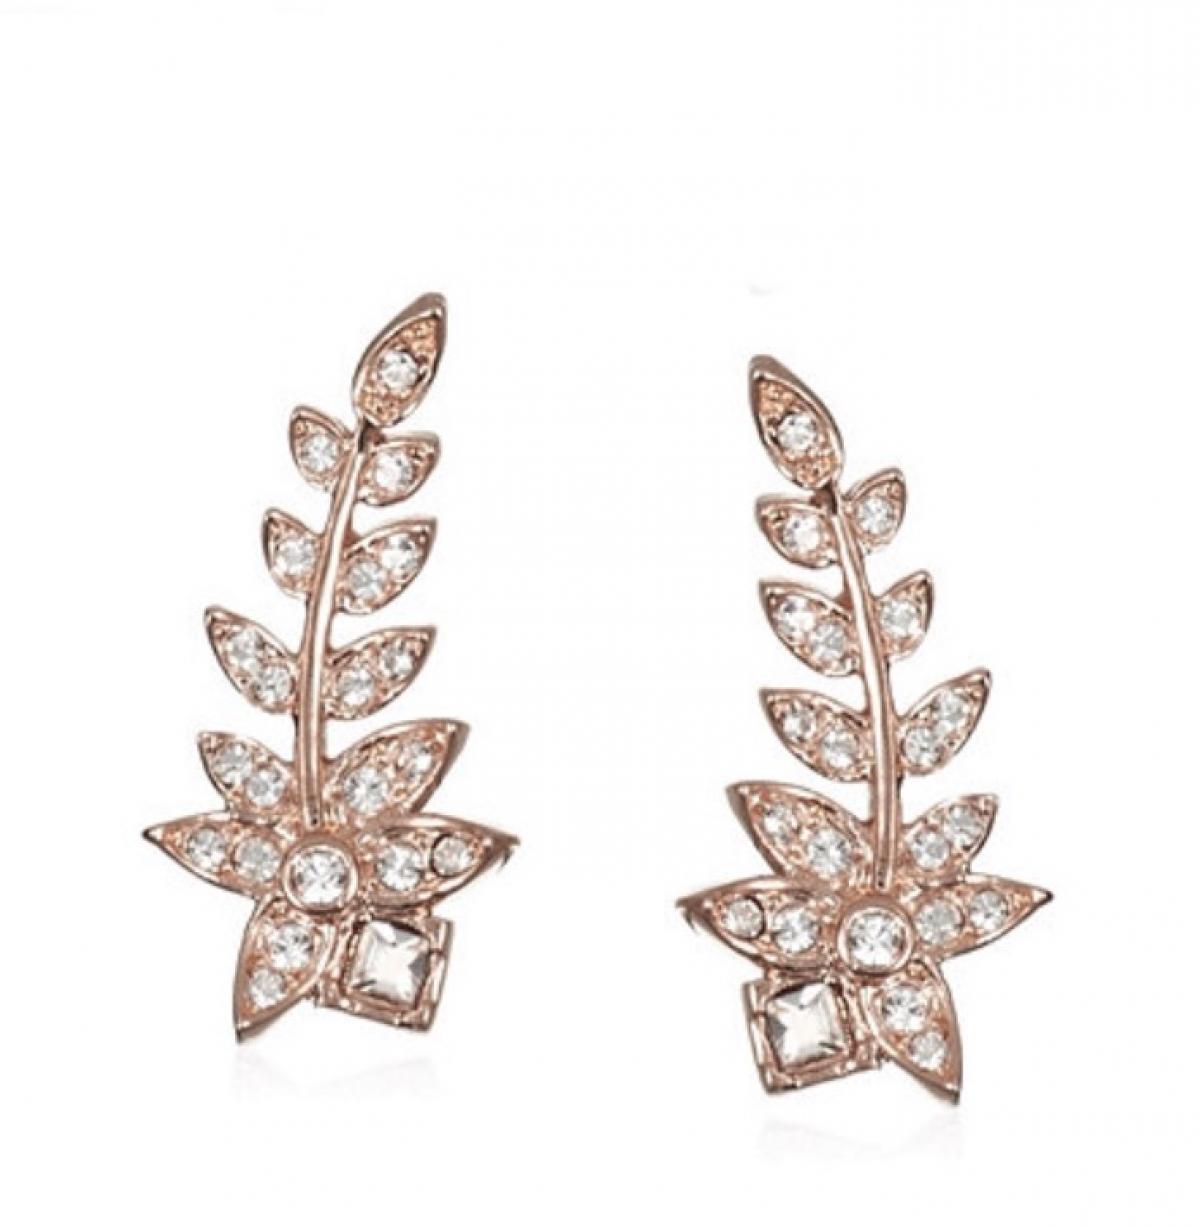 Crystal Fern Ear Climber Earrings Rose Gold Fashion